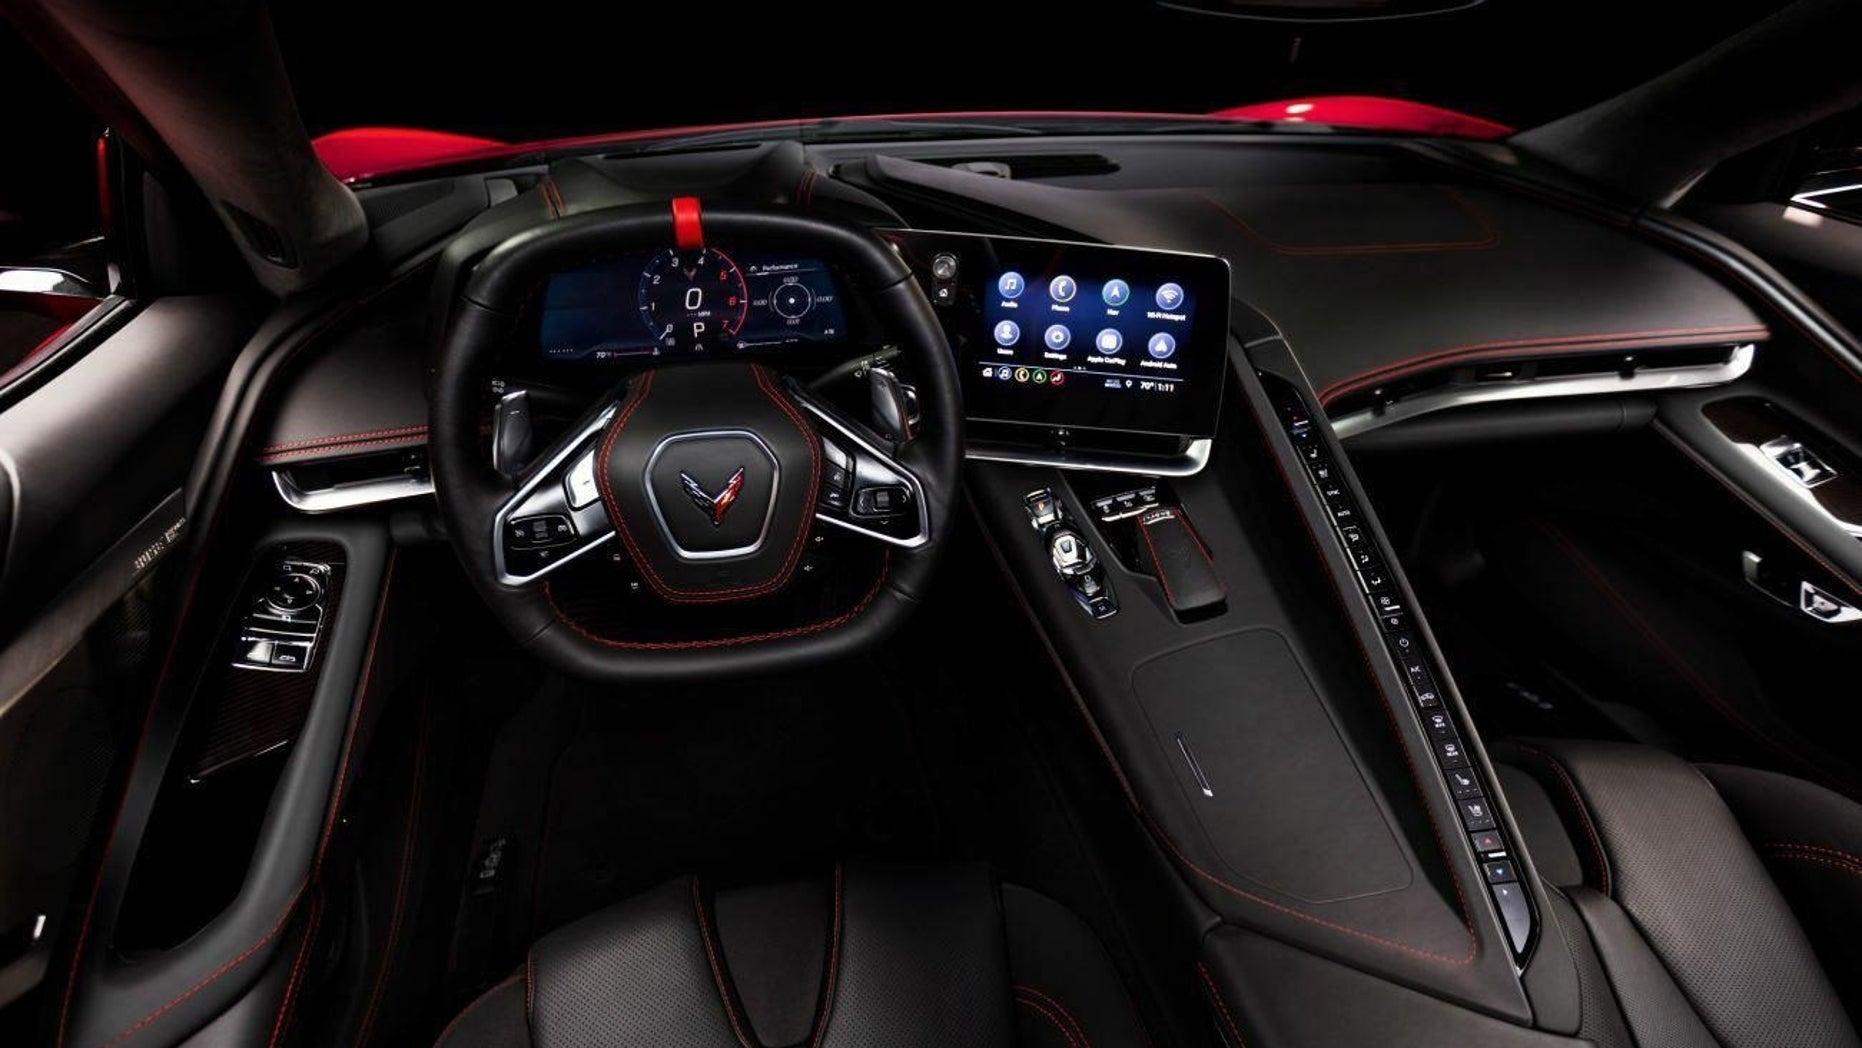 2020 Chevrolet Corvette interior